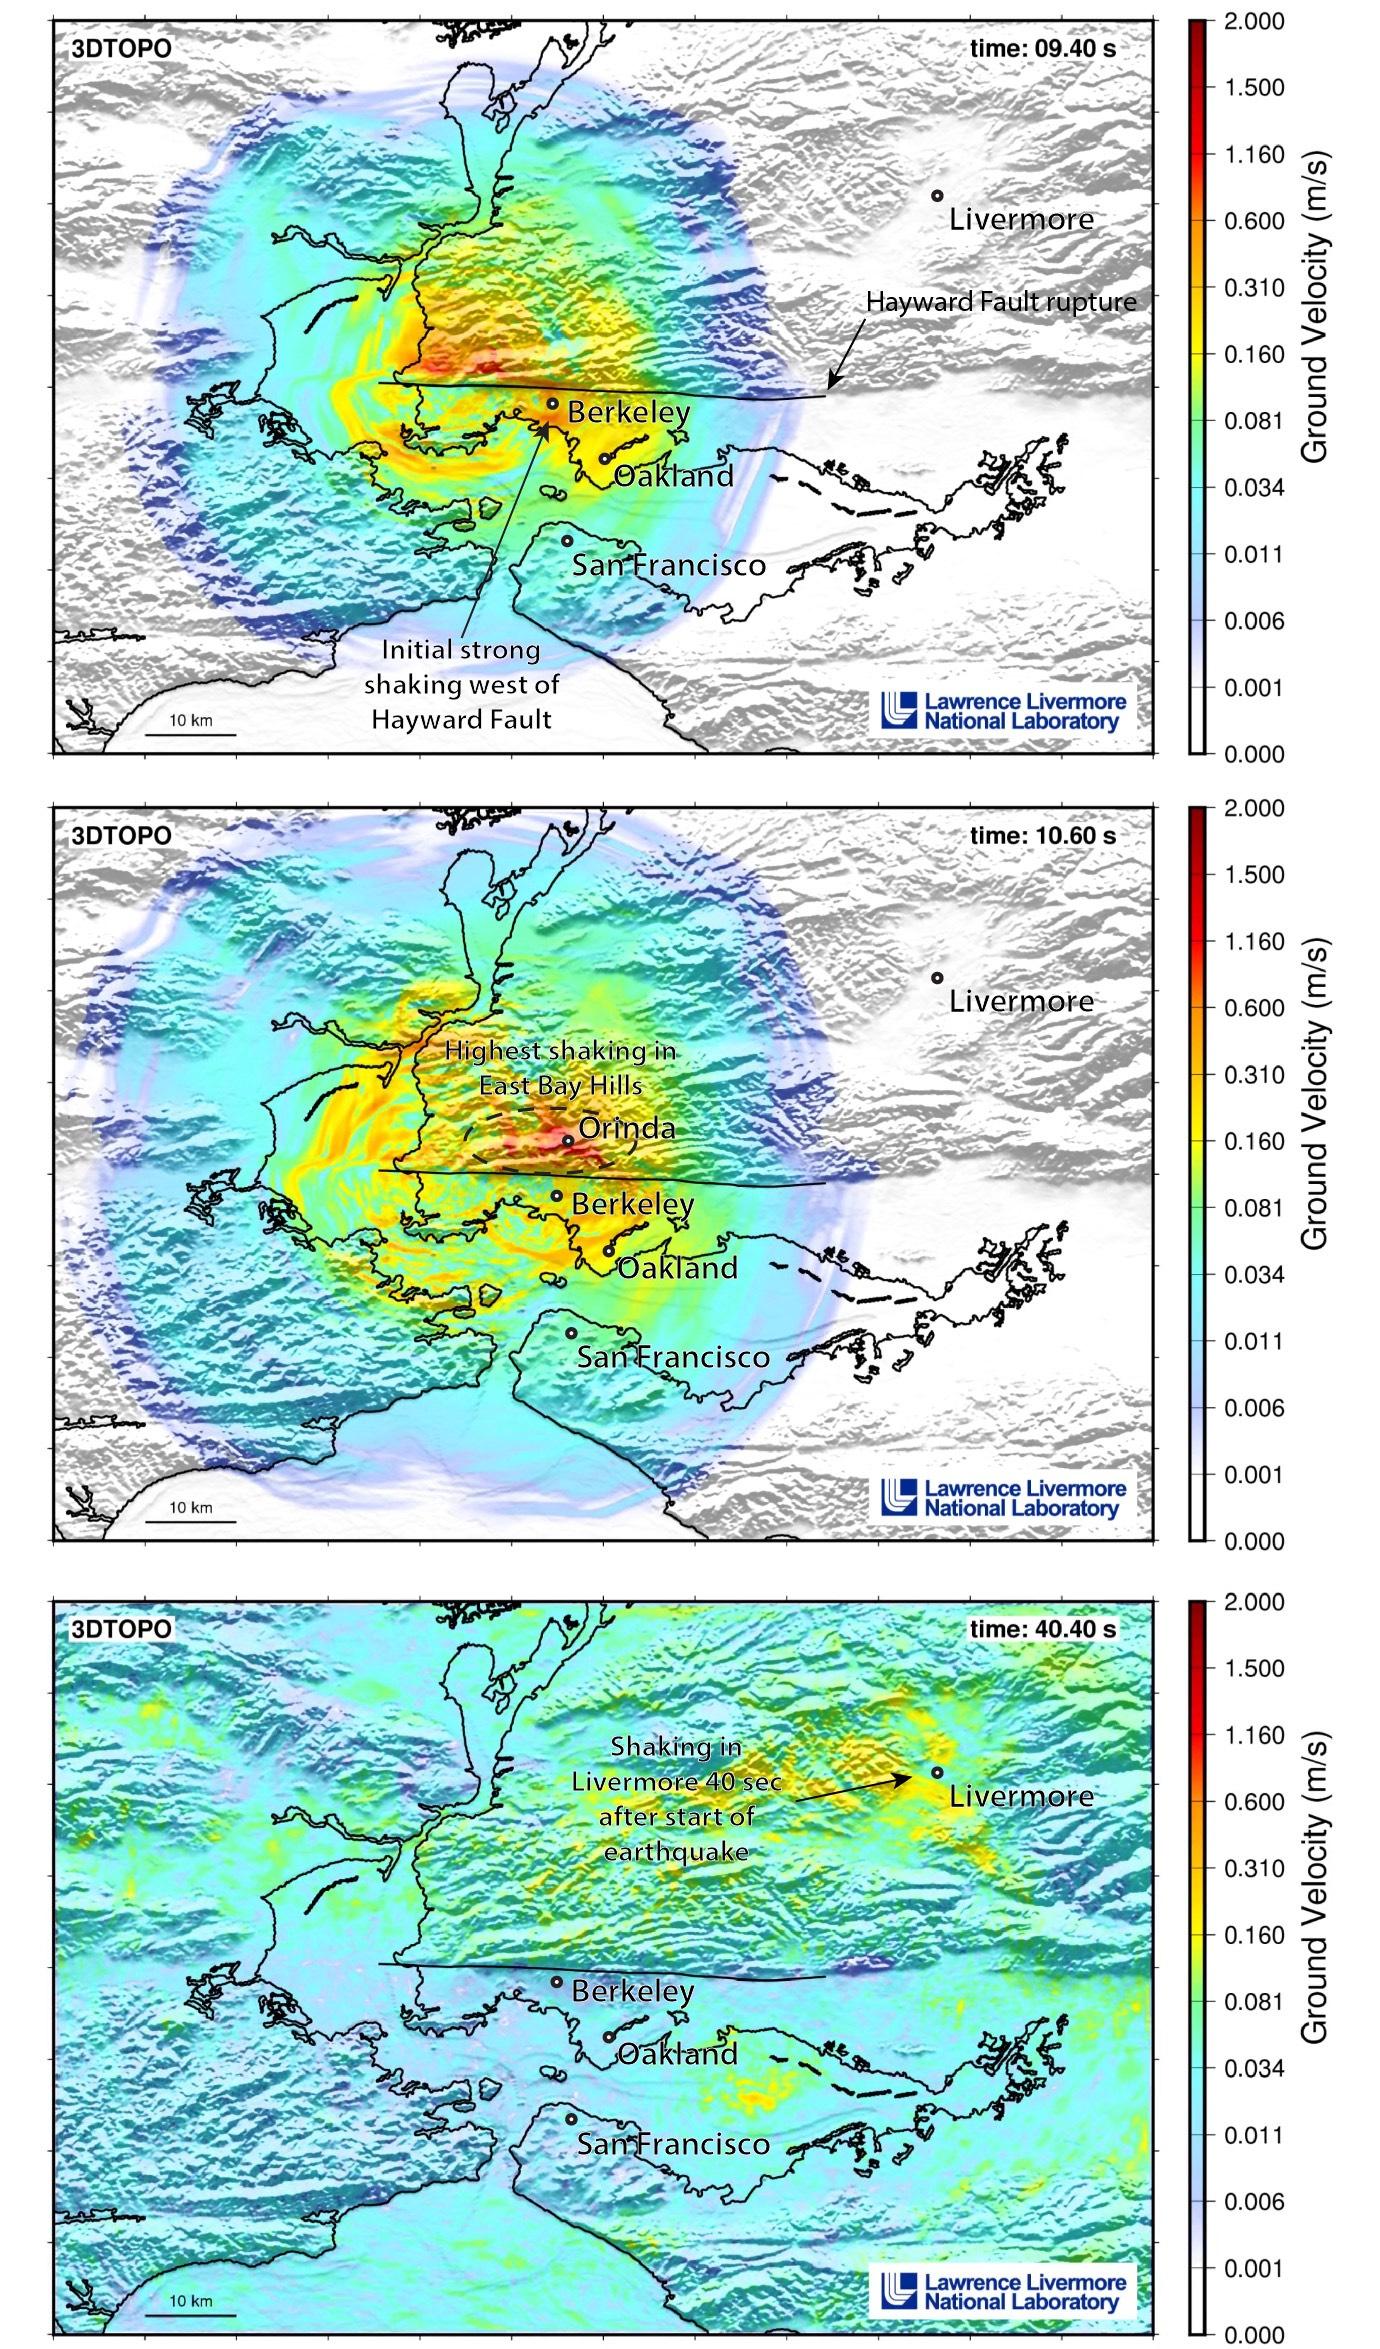 hayward-fault-rupture-east-bay